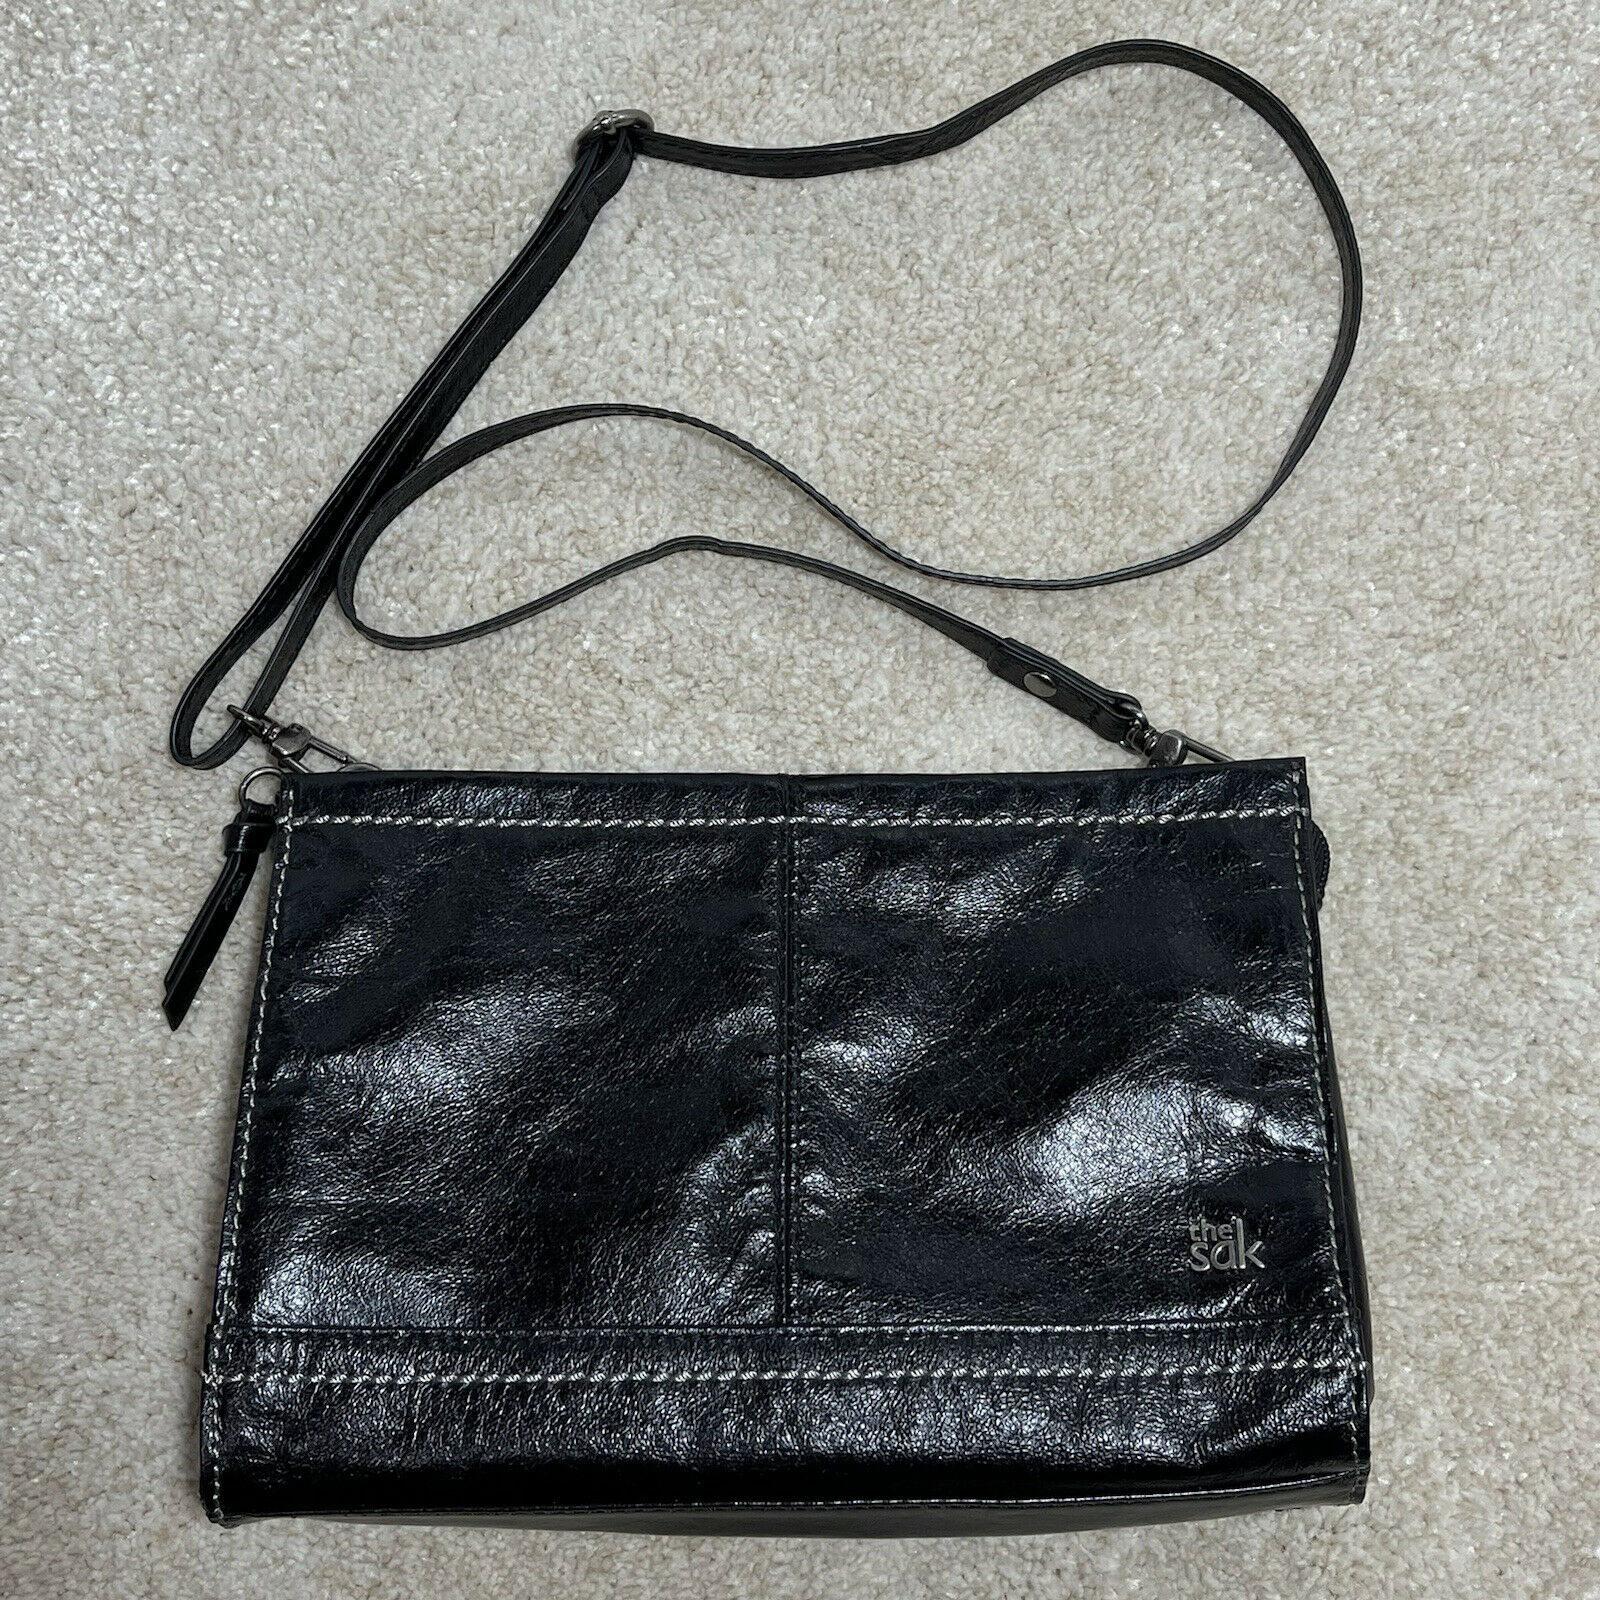 The Sak Leather Iris Black Demi Clutch 3 Way Adjustable Crossbody Strap Bag